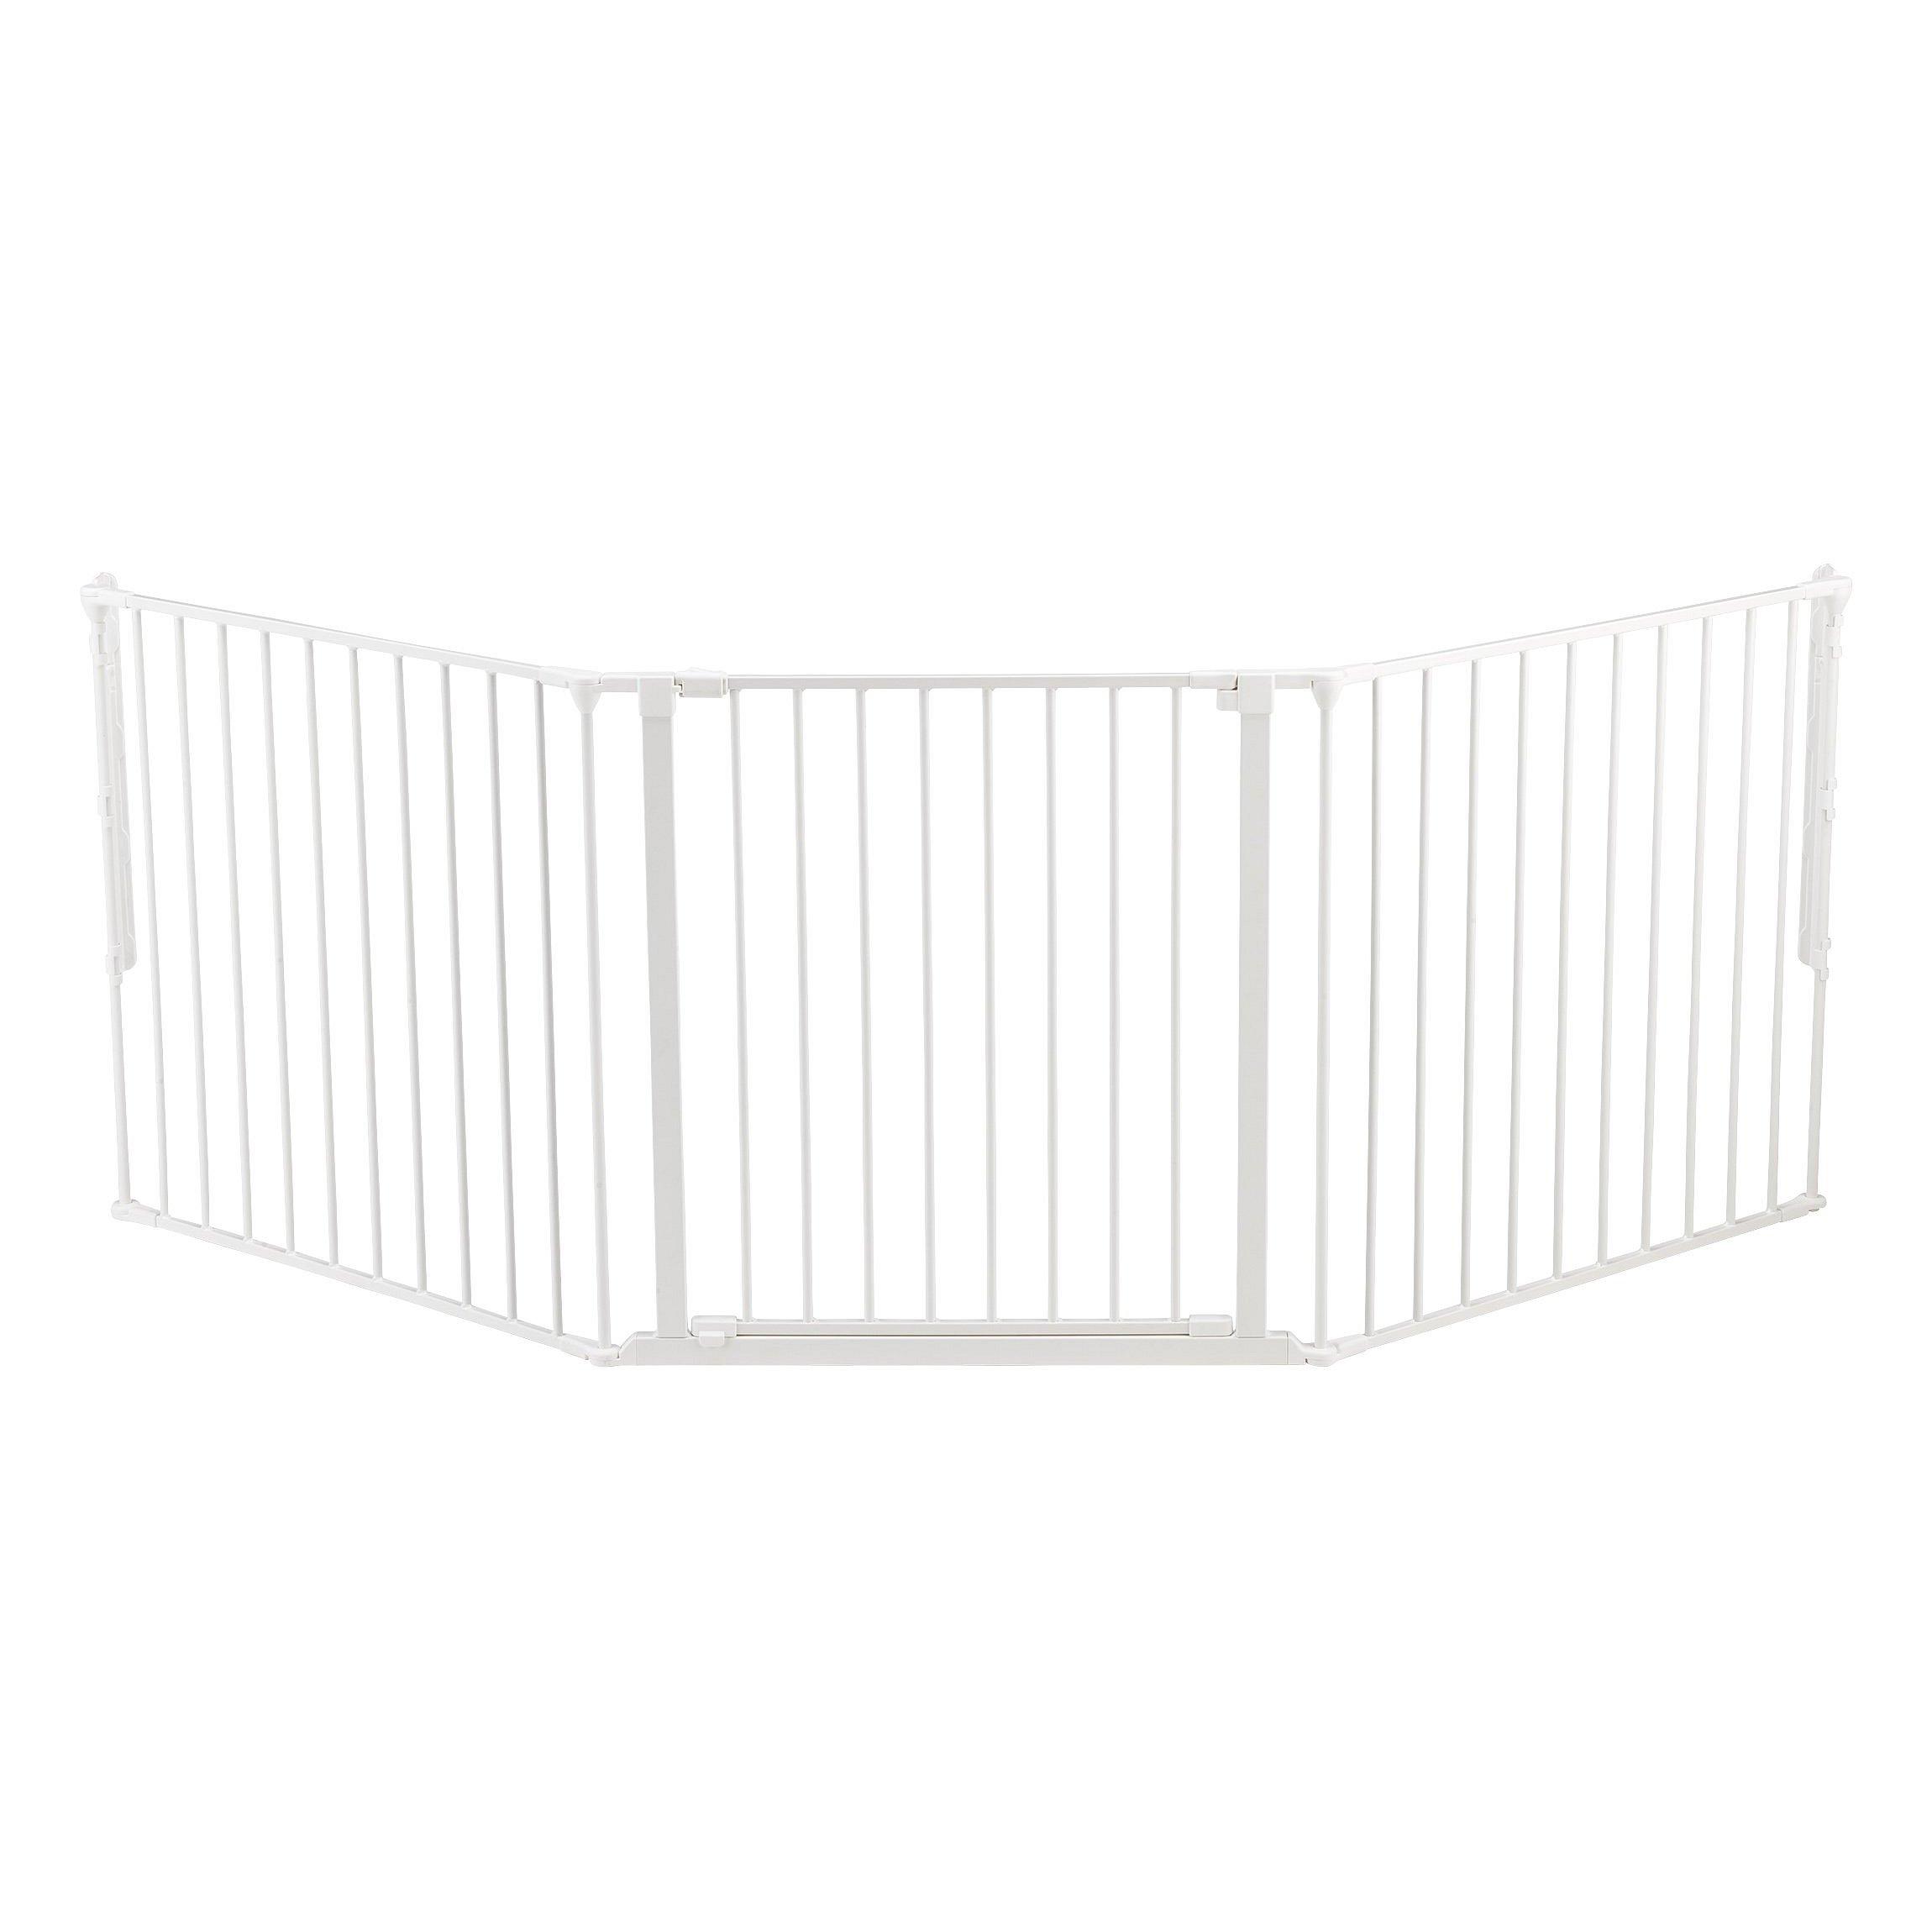 BABYDAN Prostorová zábrana New Flex L 90-225 cm, bílá